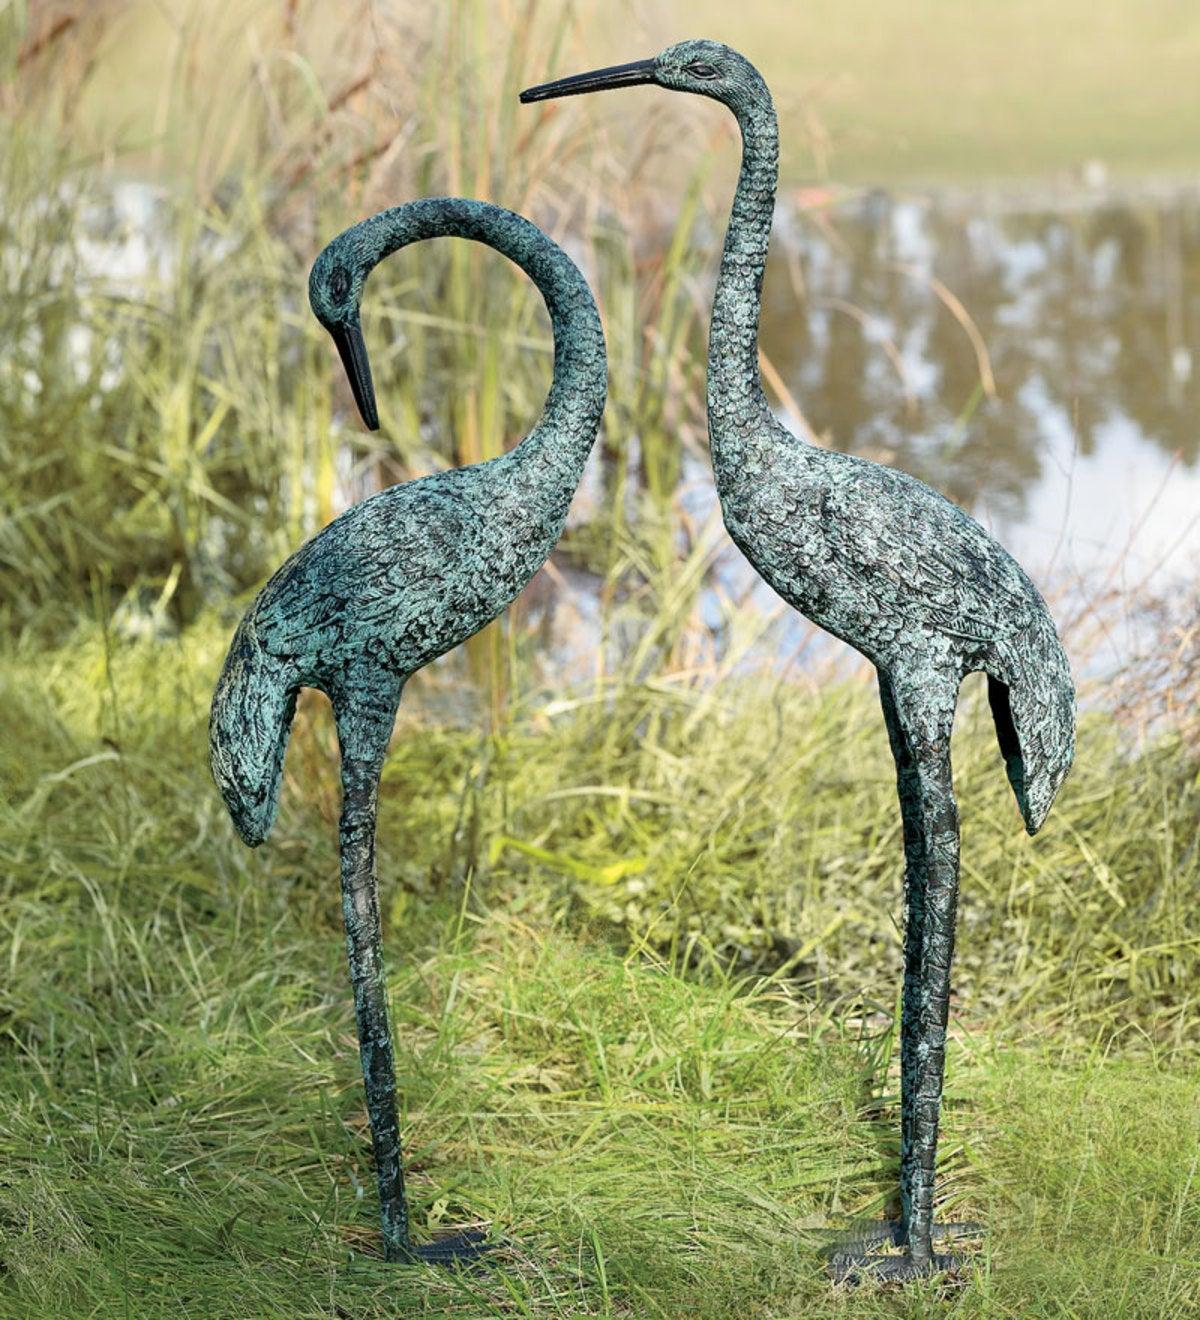 Garden Cranes, set of 2 - Garden Art